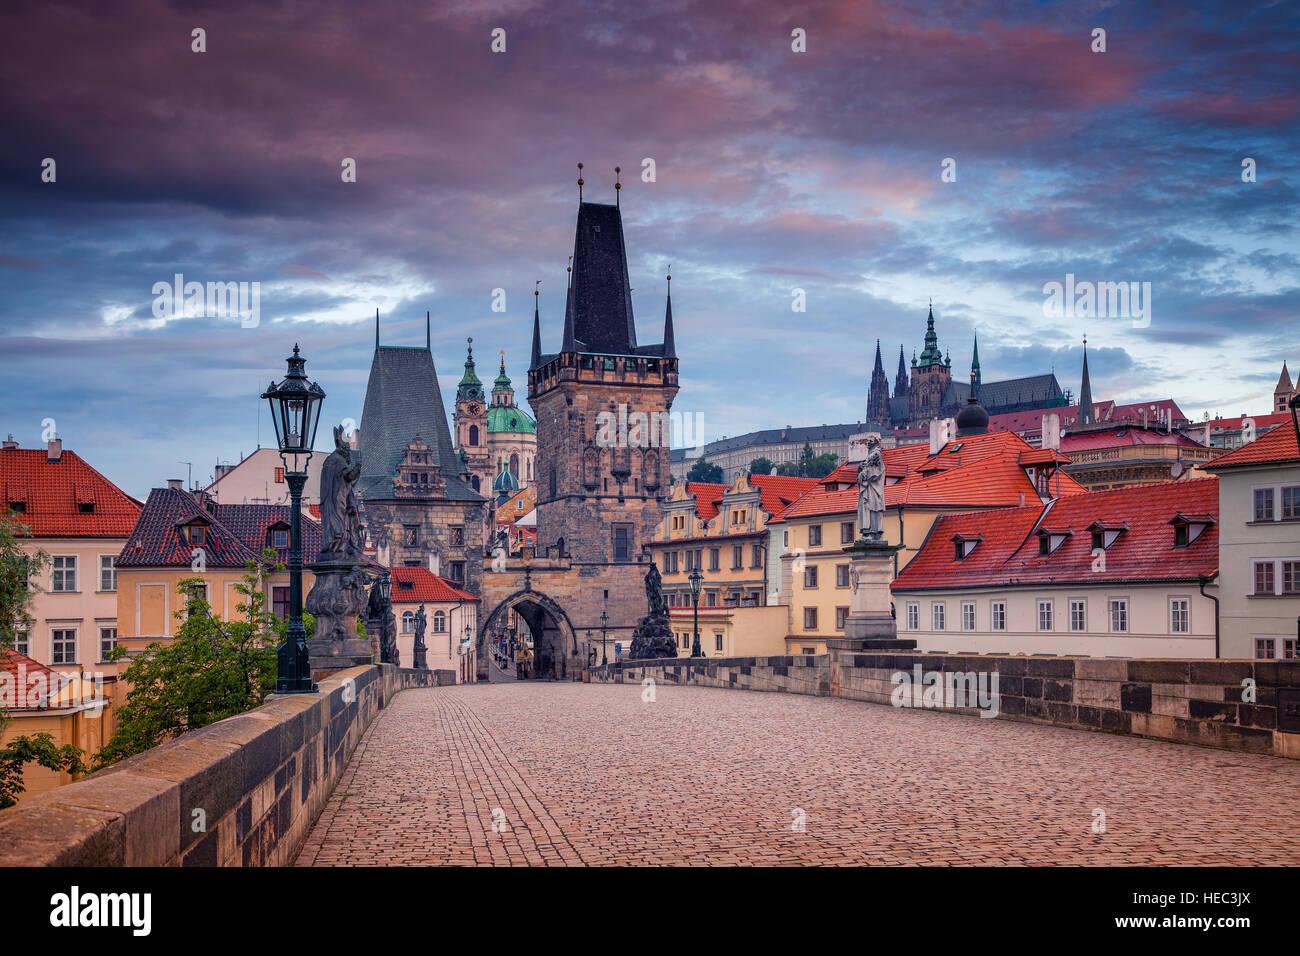 Charles Bridge, Prague. Cityscape image of Charles Bridge in Prague, Czech Republic during sunrise. - Stock Image